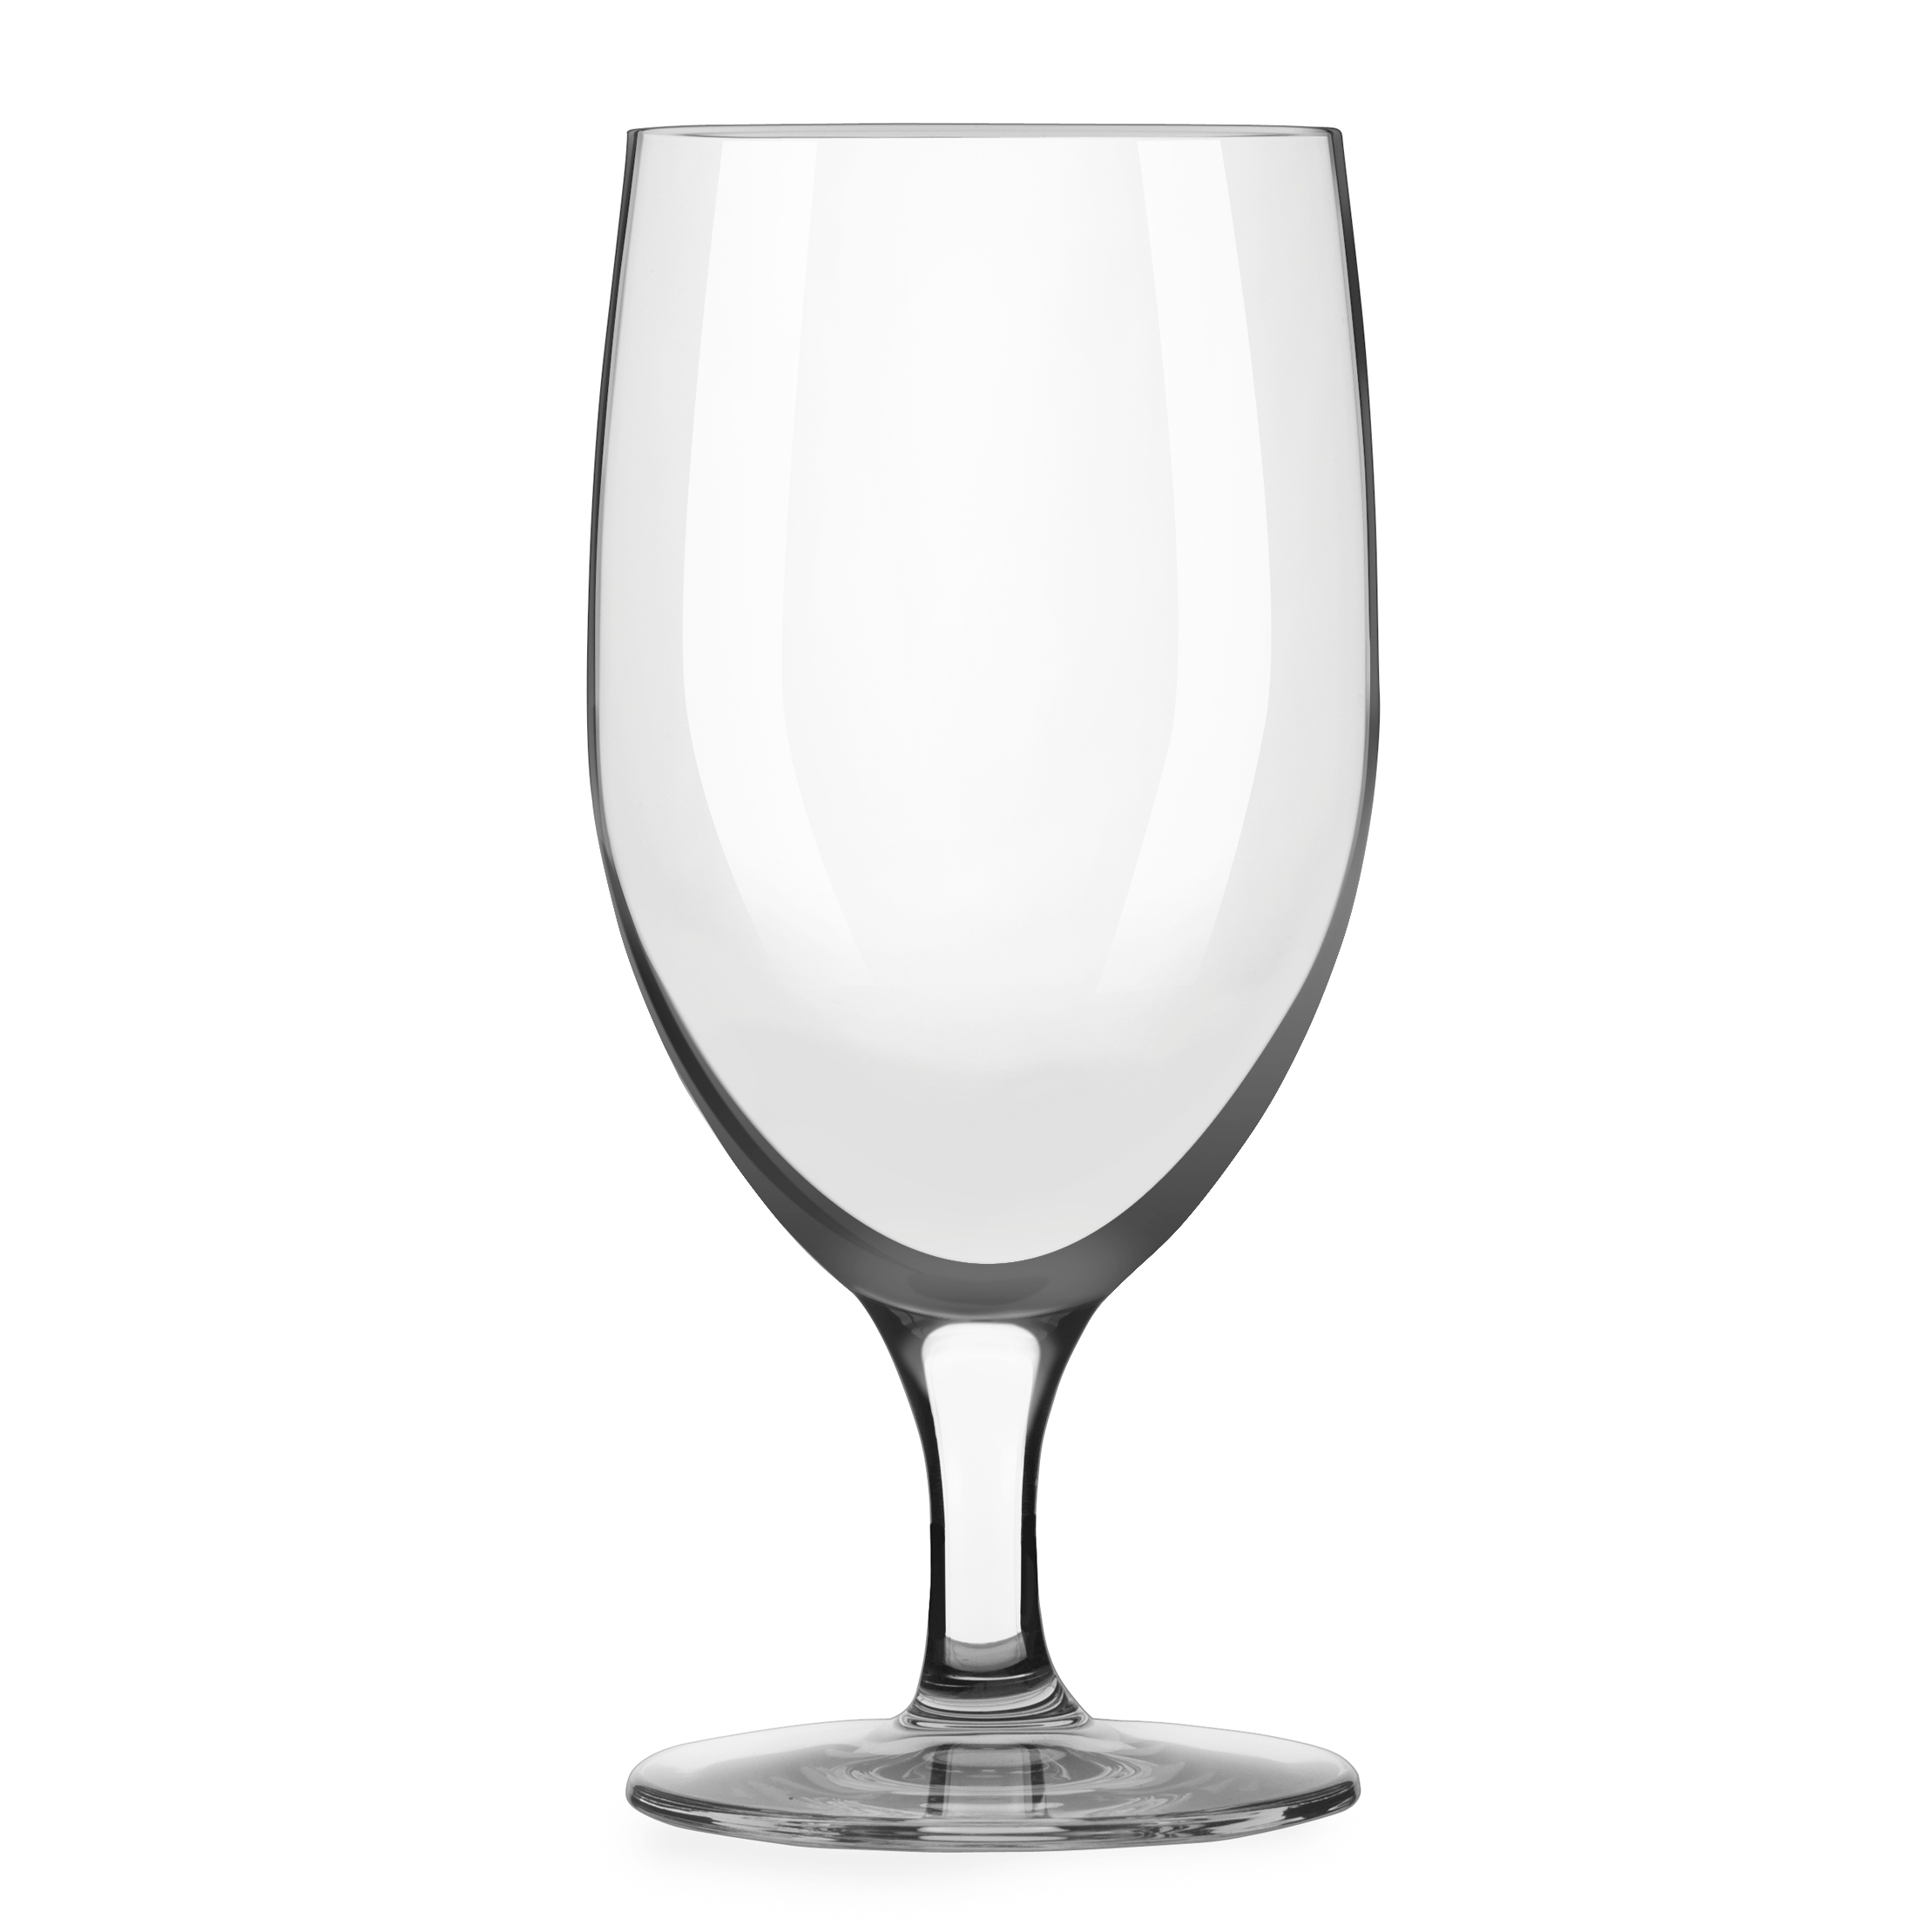 Libbey Glass 9155 glass, goblet